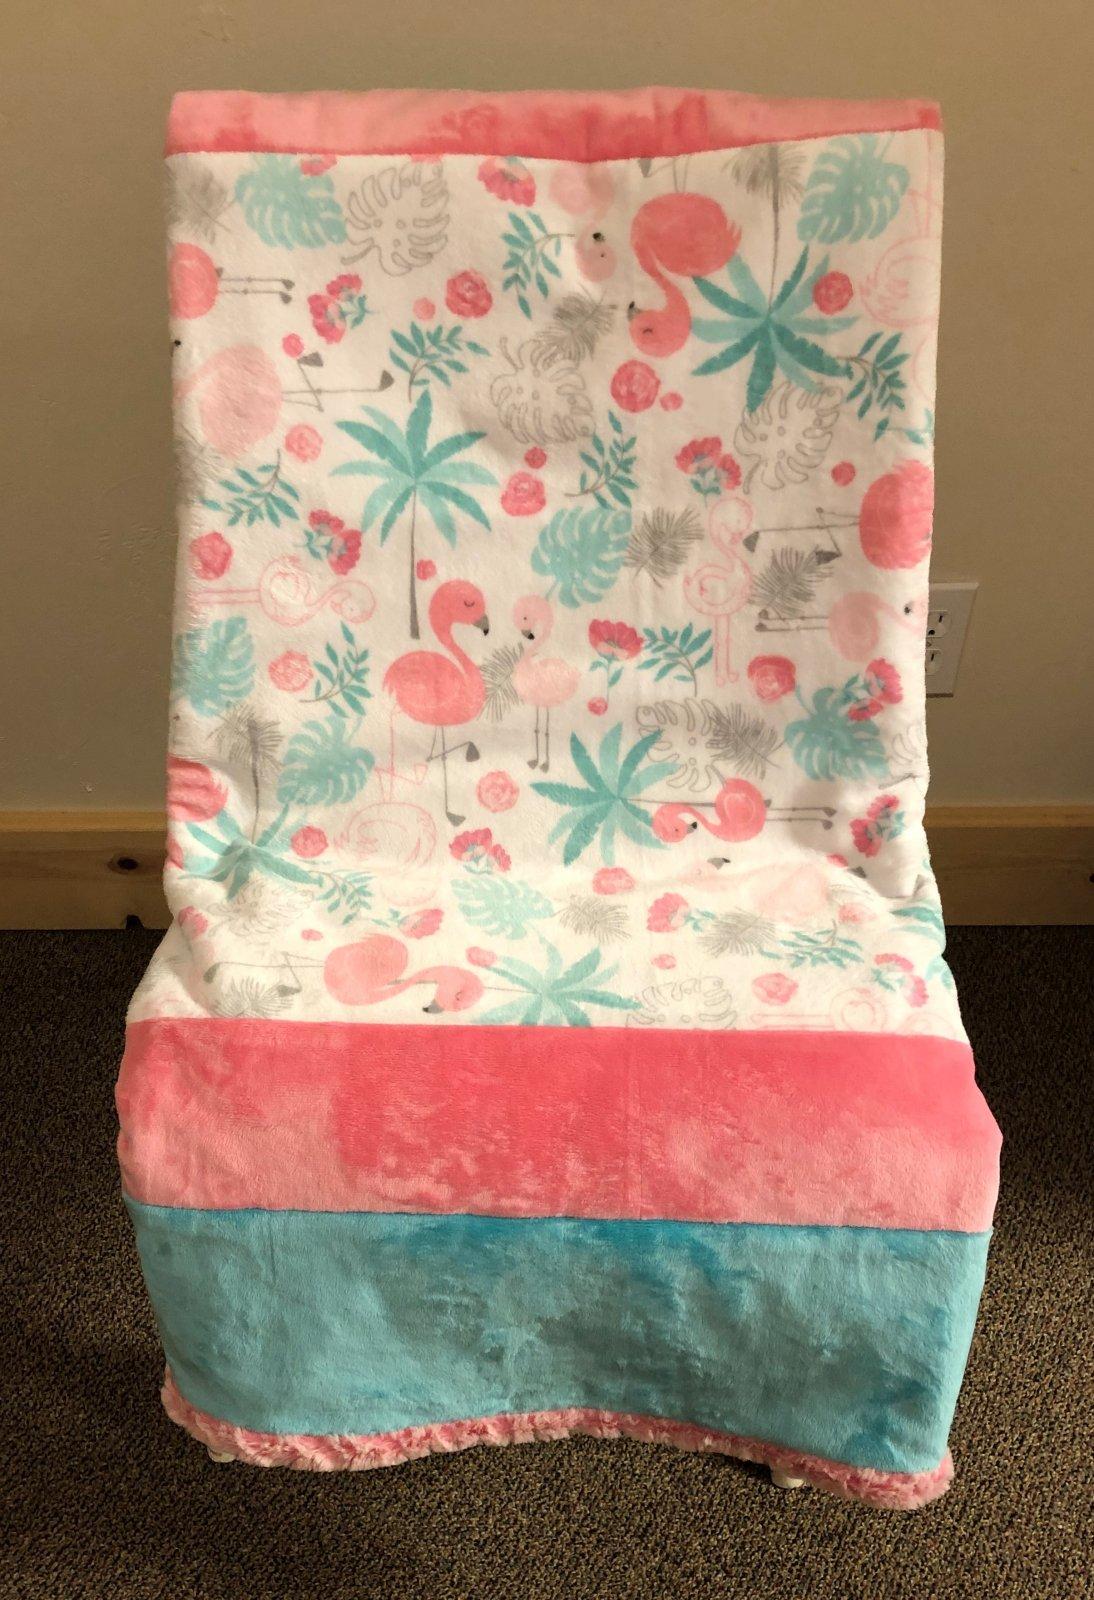 Flamingo Crib quilt 45 by 60